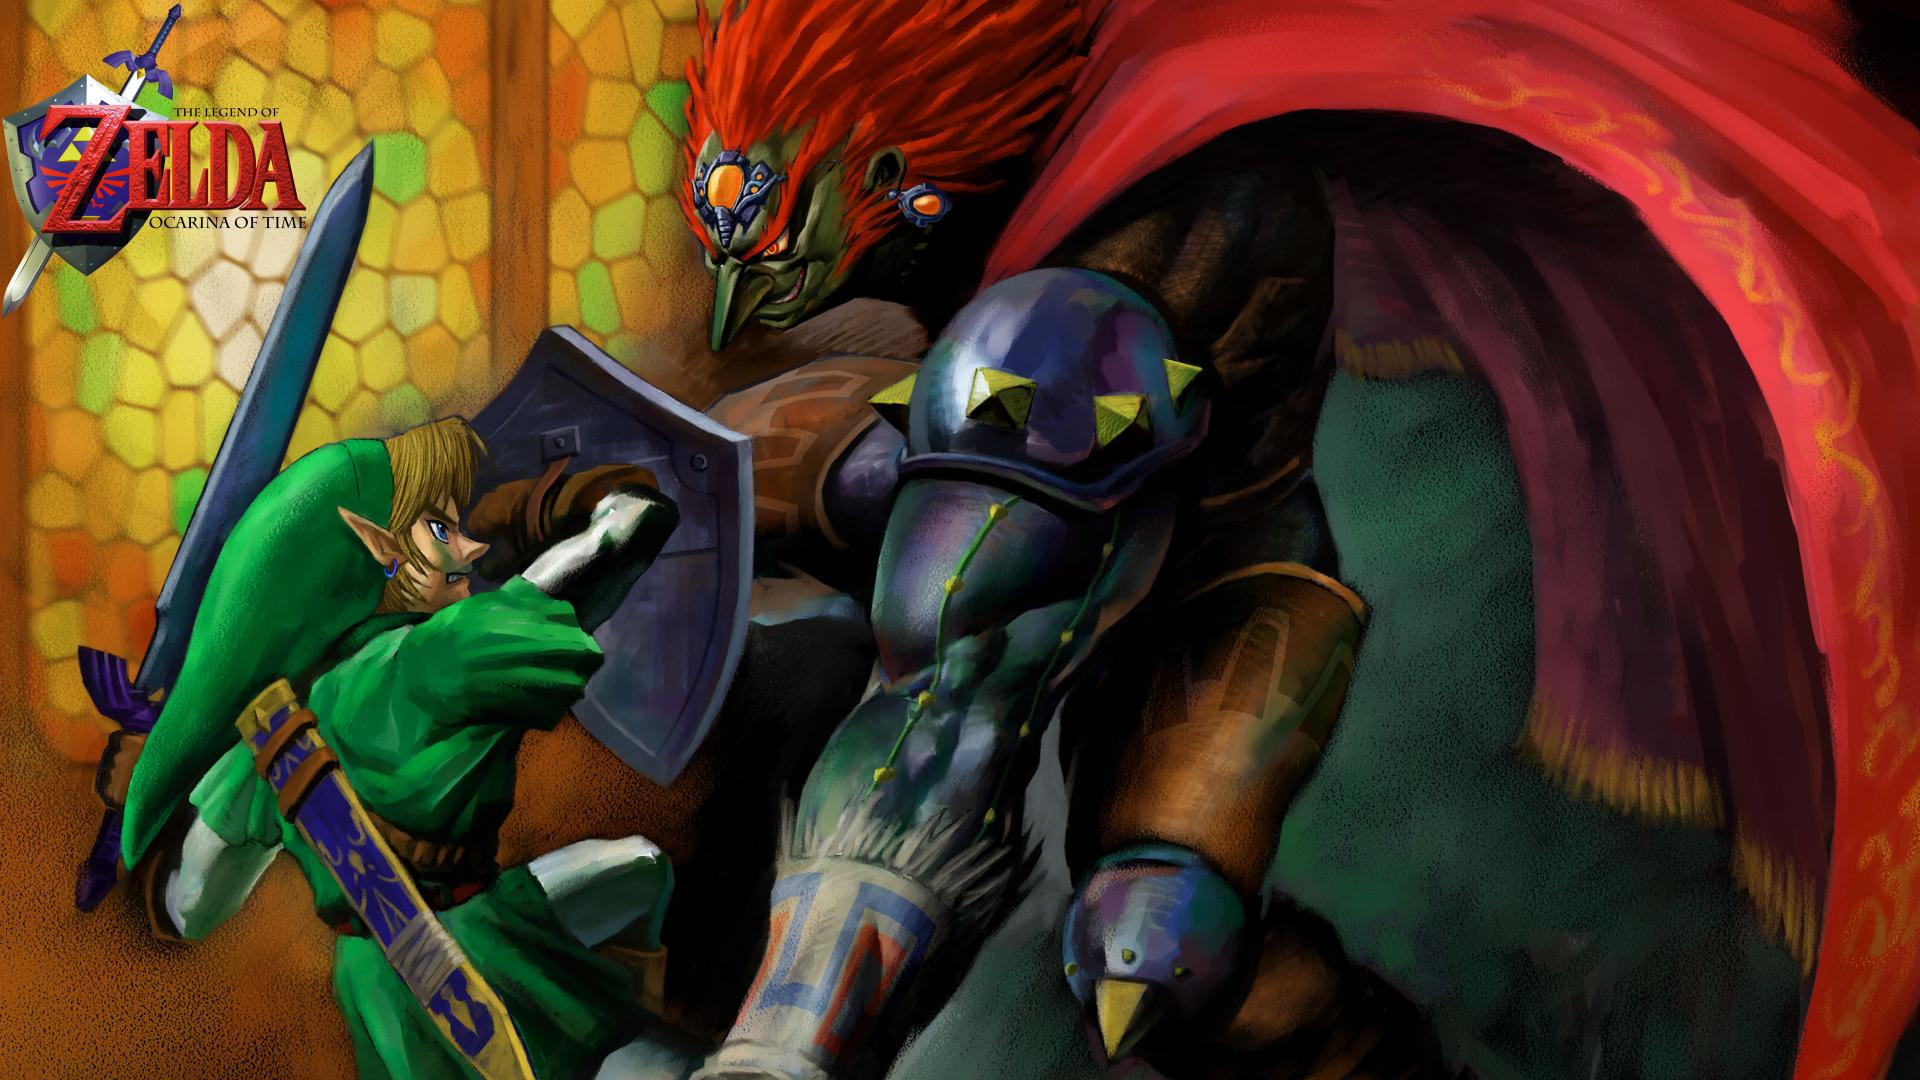 Video Game - The Legend Of Zelda: Ocarina Of Time  Link Ganondorf Wallpaper